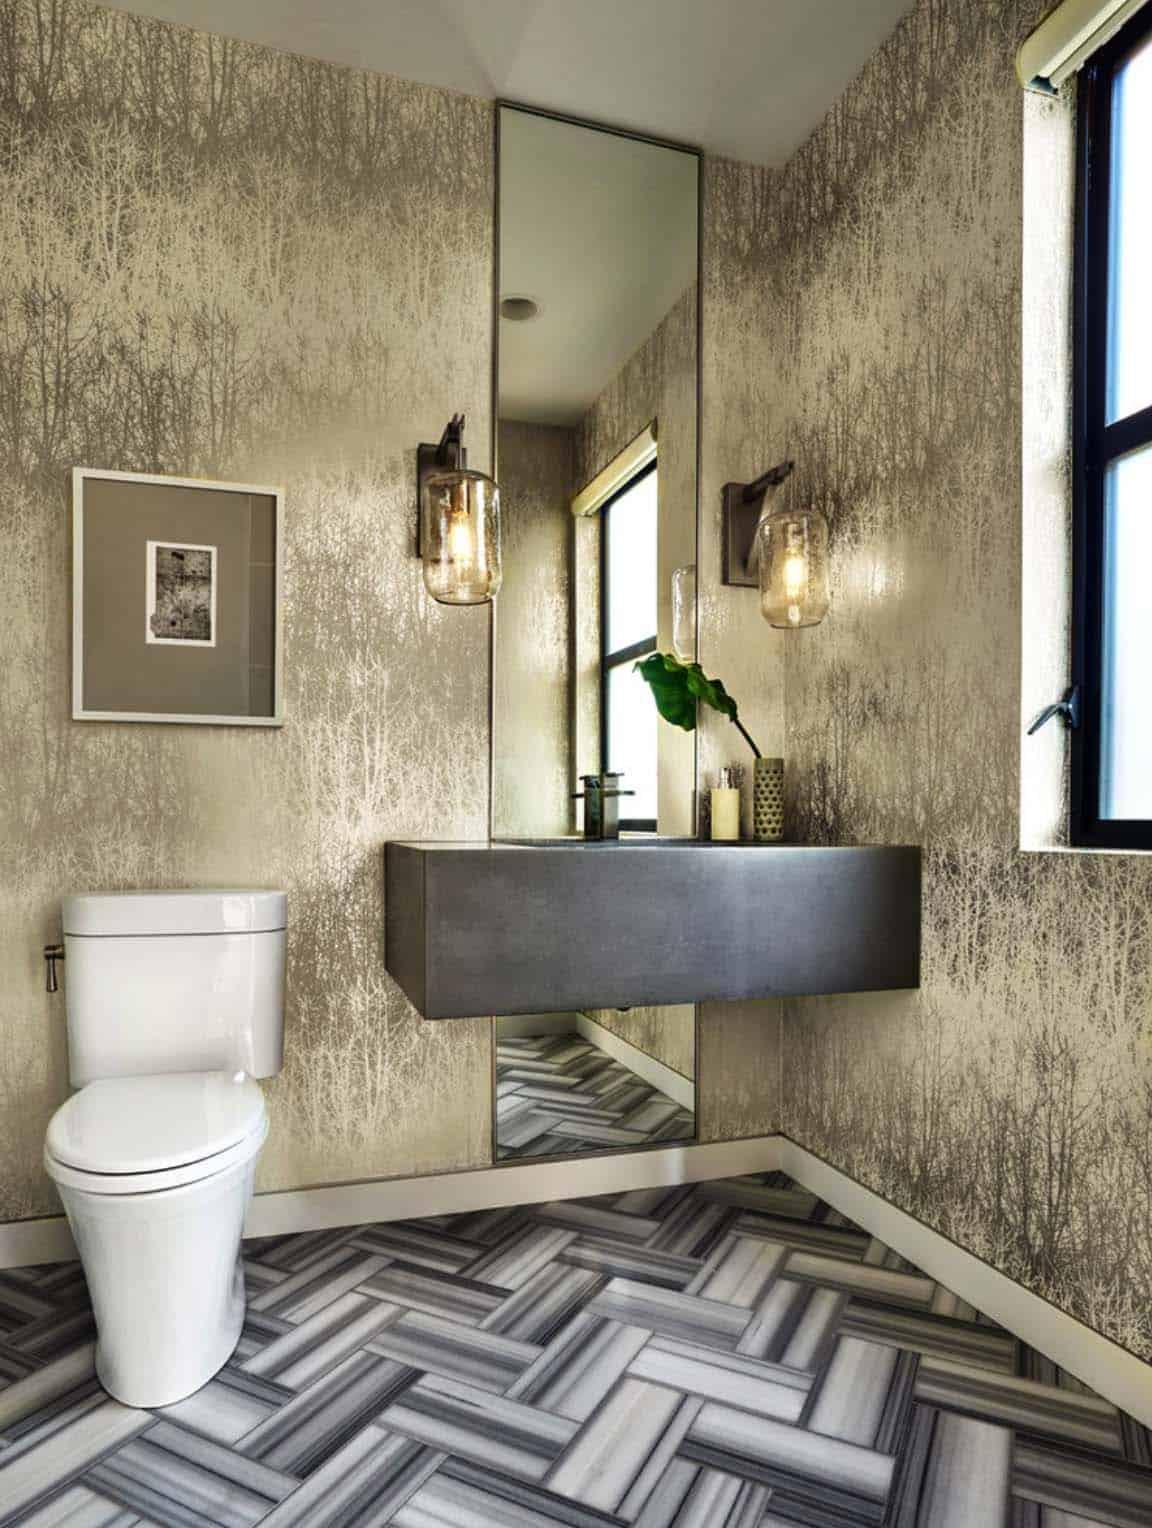 bain-de-poudre-contemporain